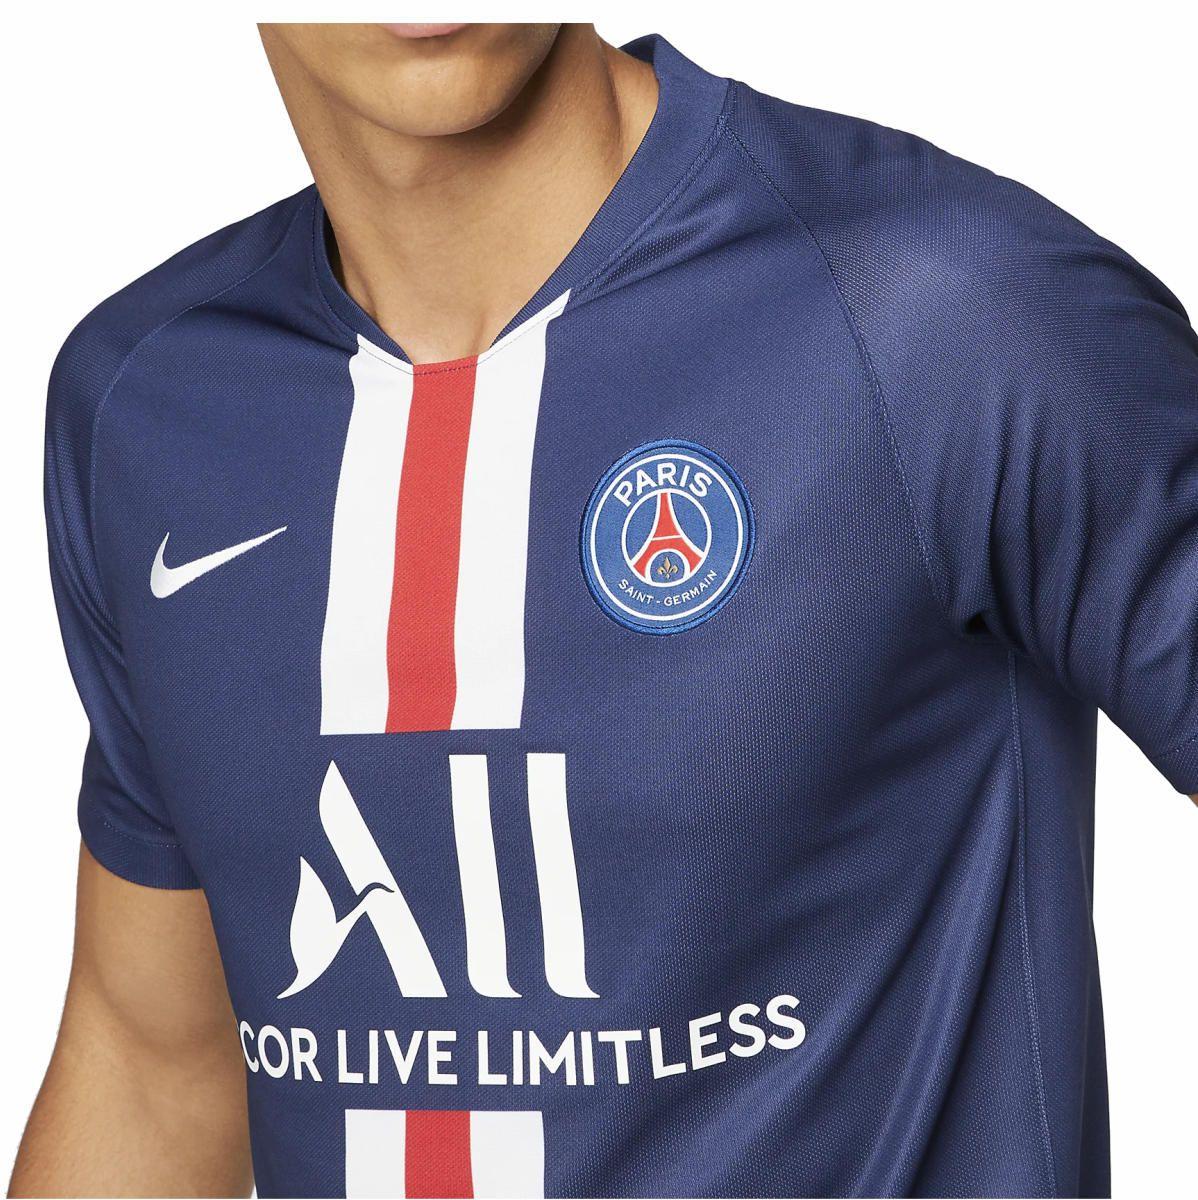 Camisa Nike PSG Paris Saint-Germain I 2019/20 Torcedor Pro Masculina